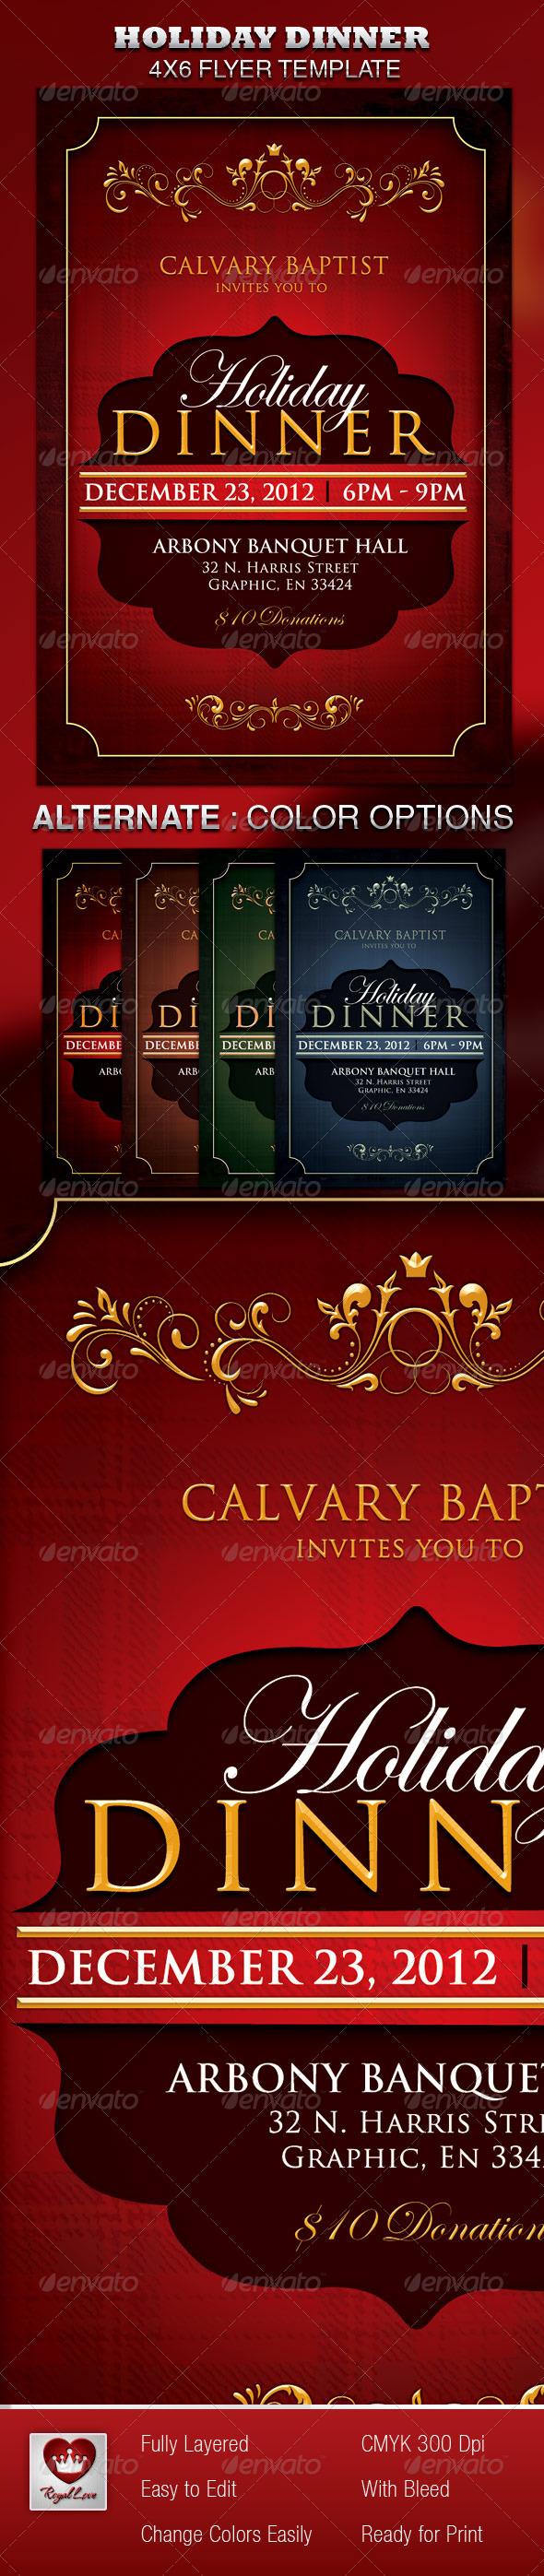 Holiday Dinner Church Flyer - Holidays Events